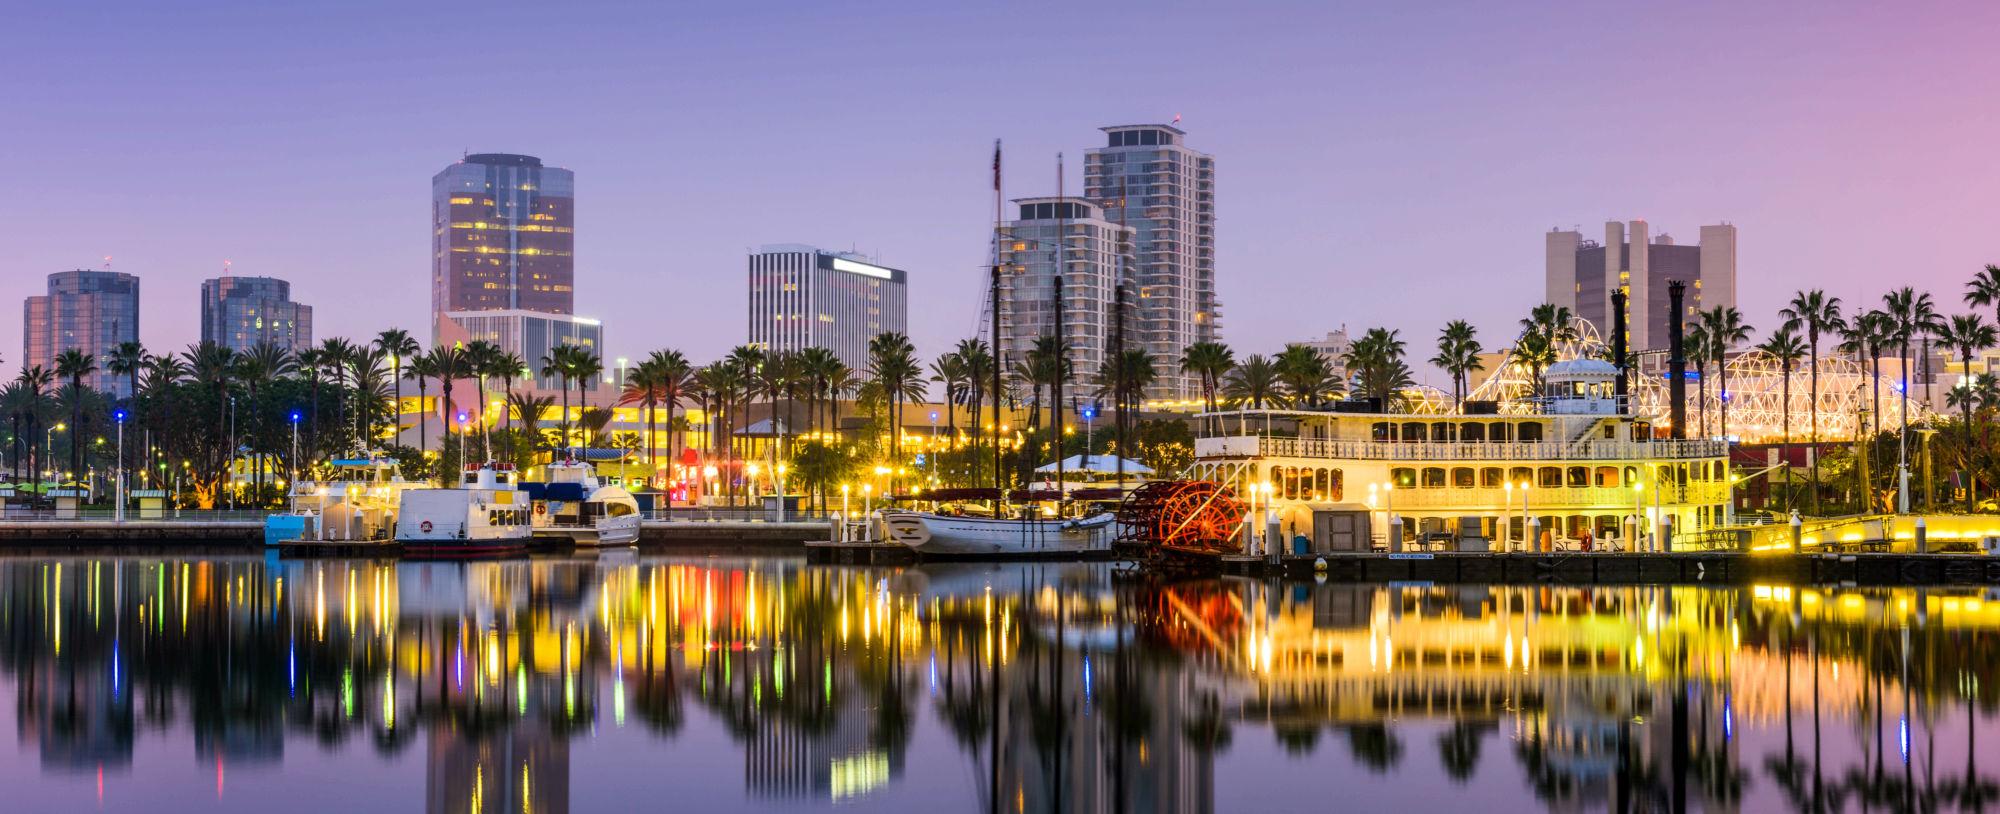 Home Security in Long Beach, California